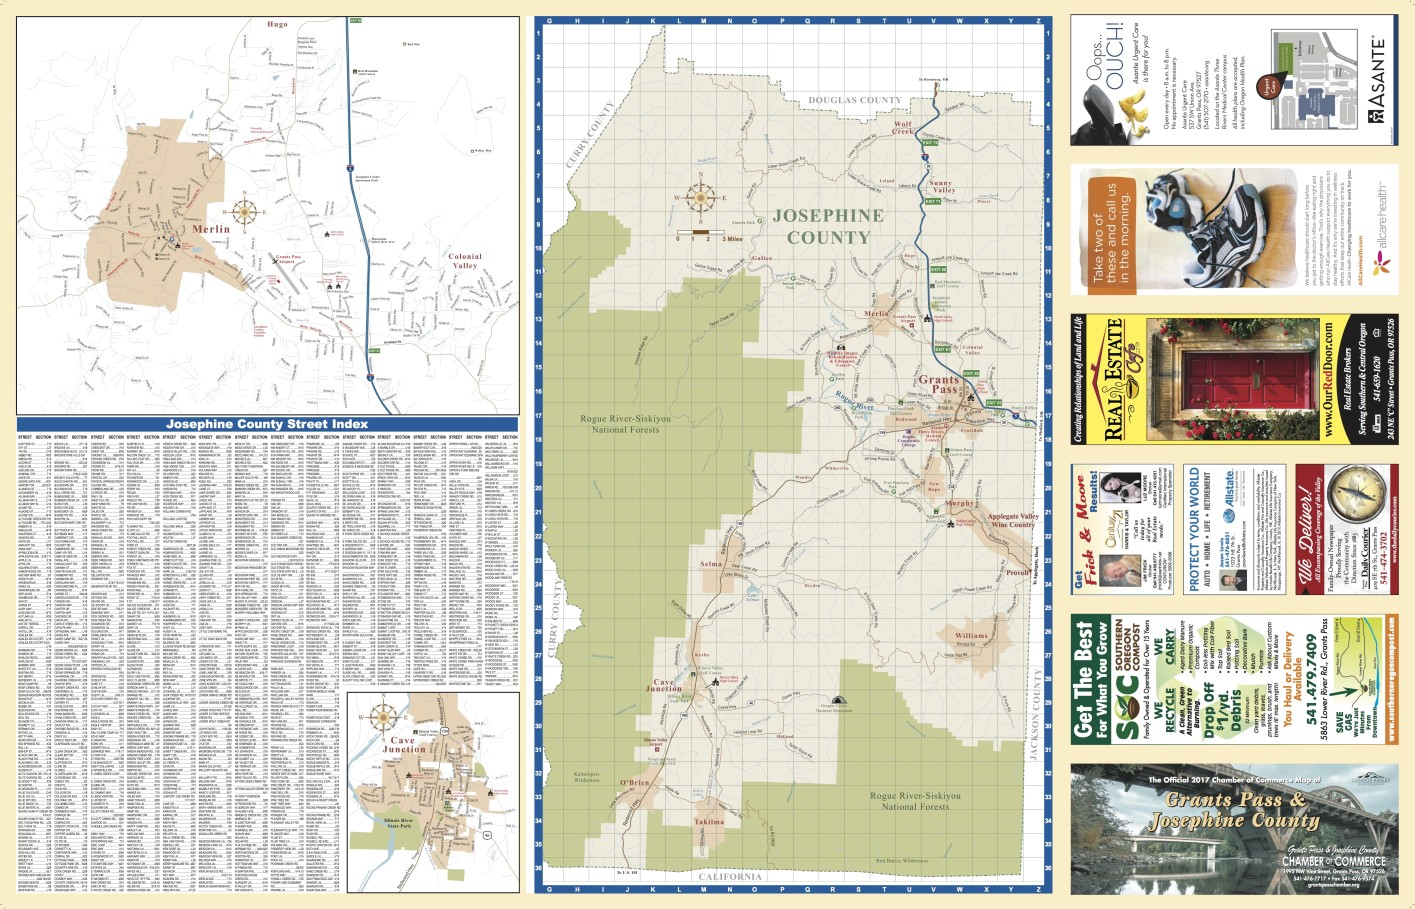 josephinecountymap2.jpg